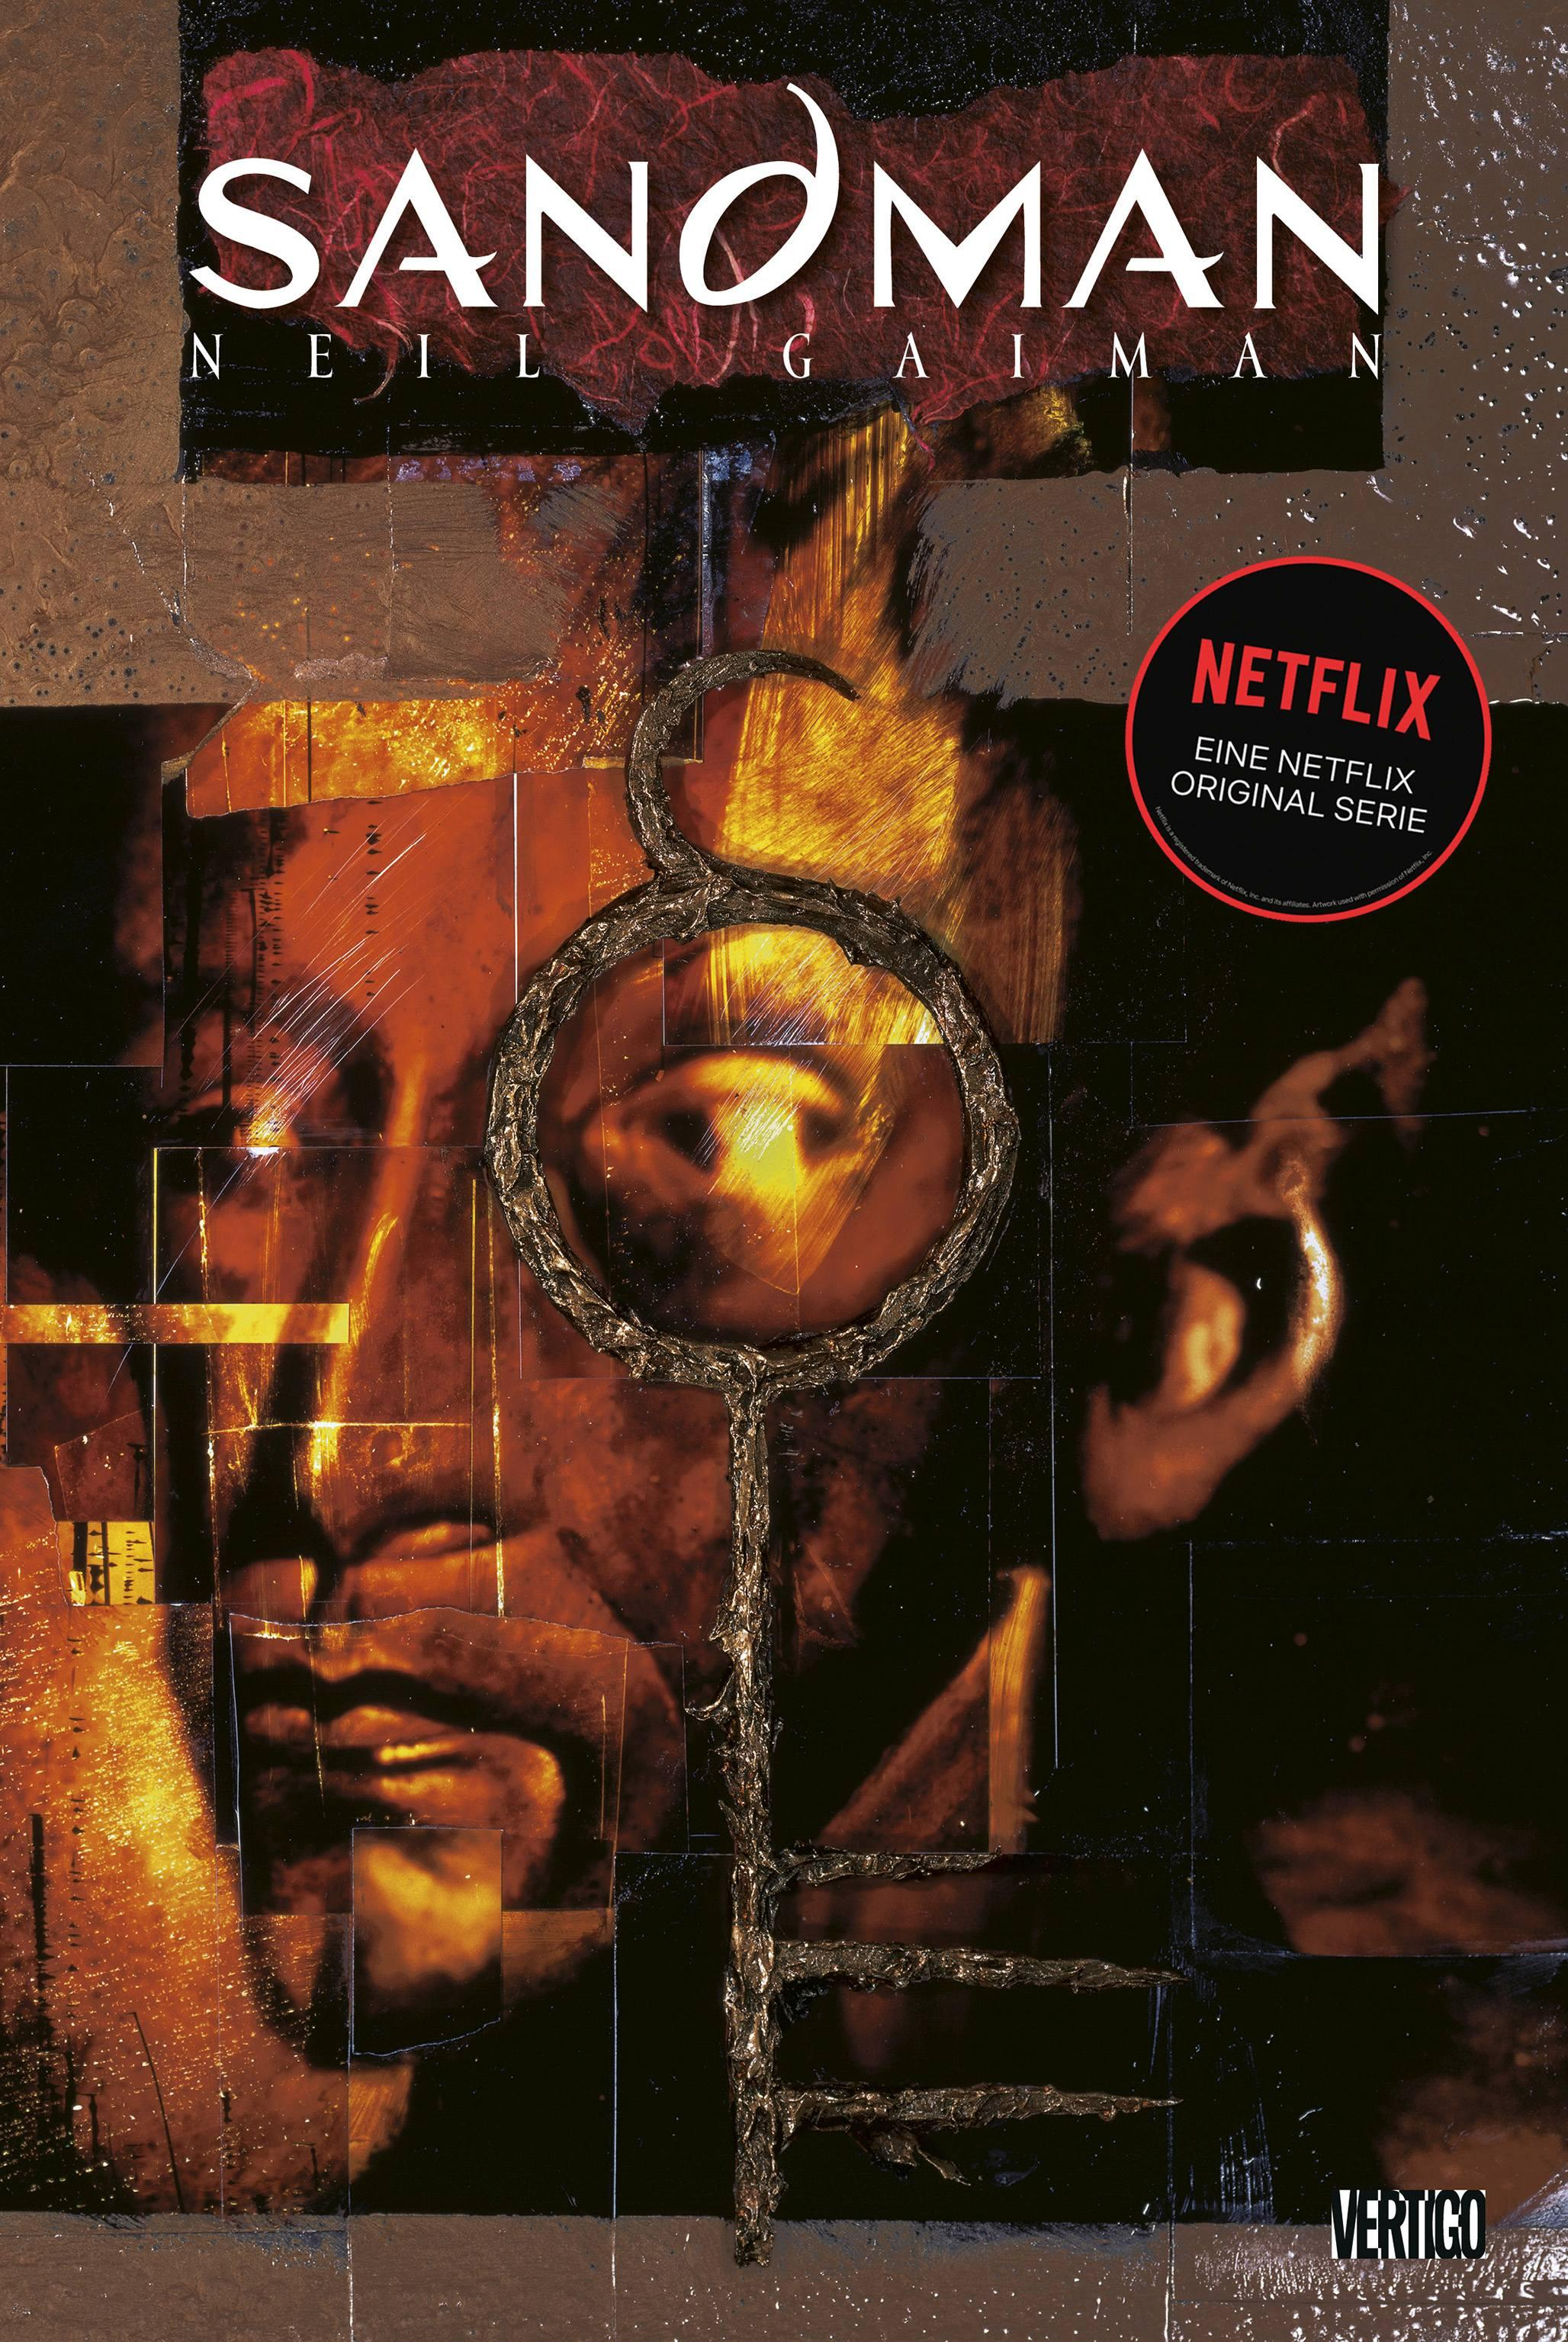 Neil Gaiman ~ Sandman Deluxe 9783741607691